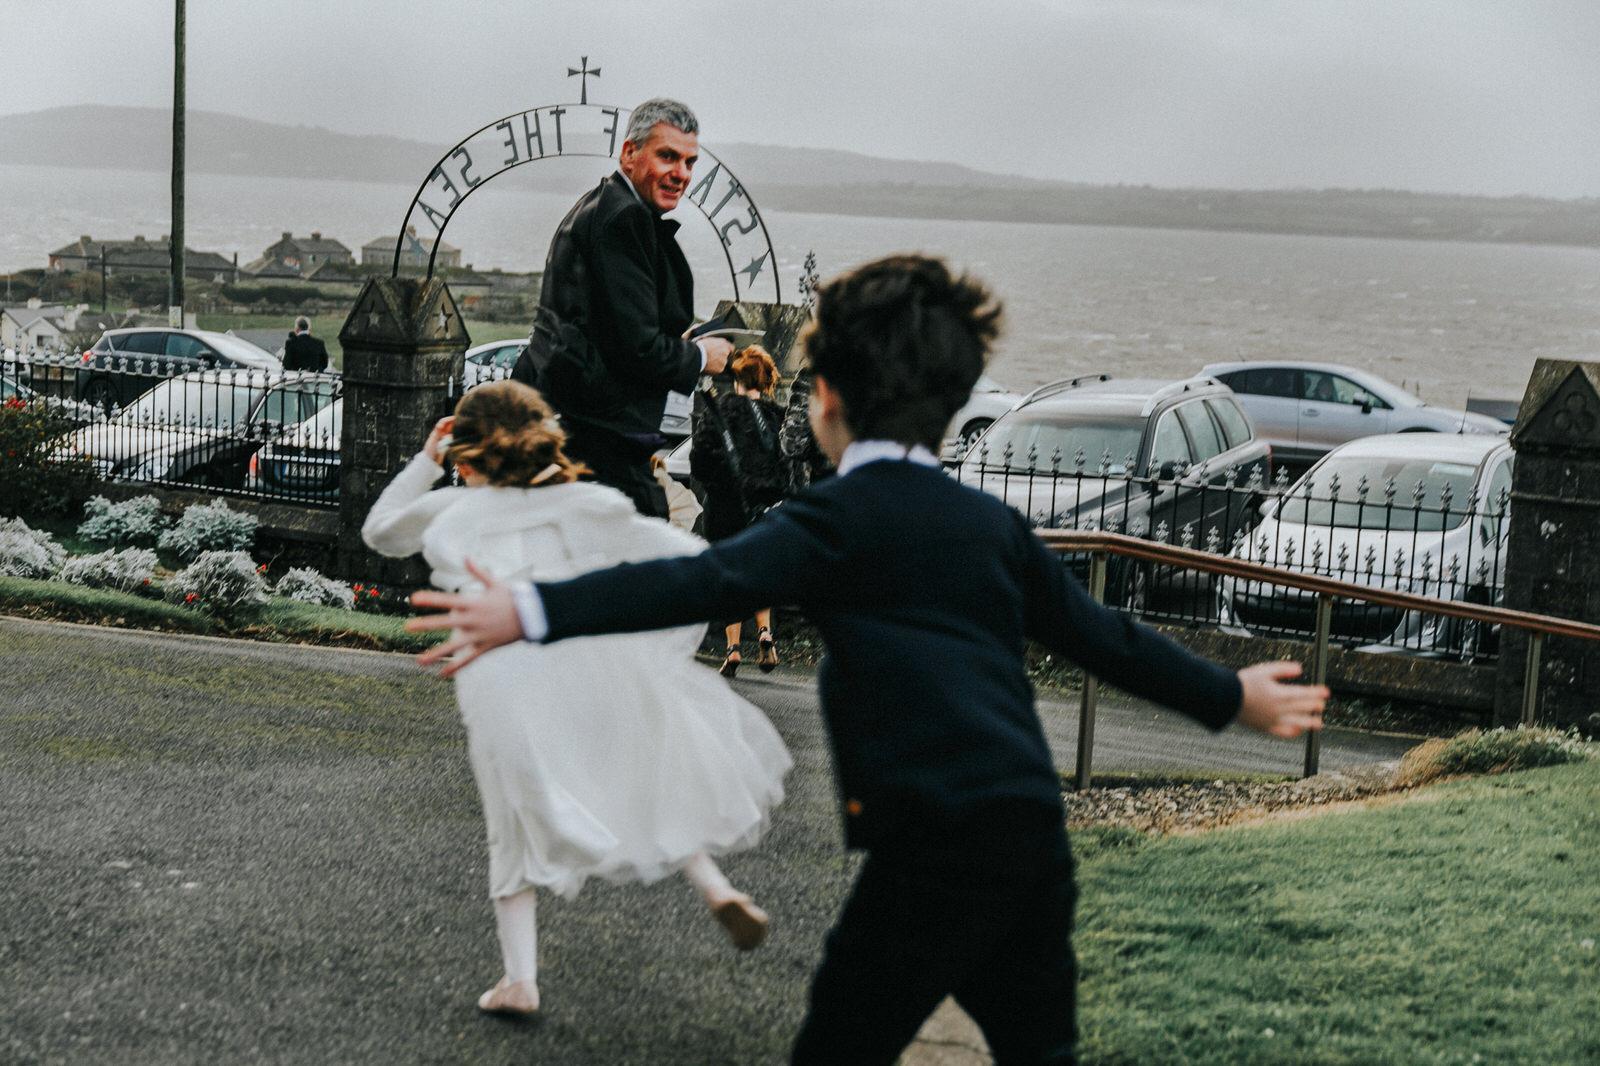 Dunbrody_House_Wedding_photographer_087.jpg